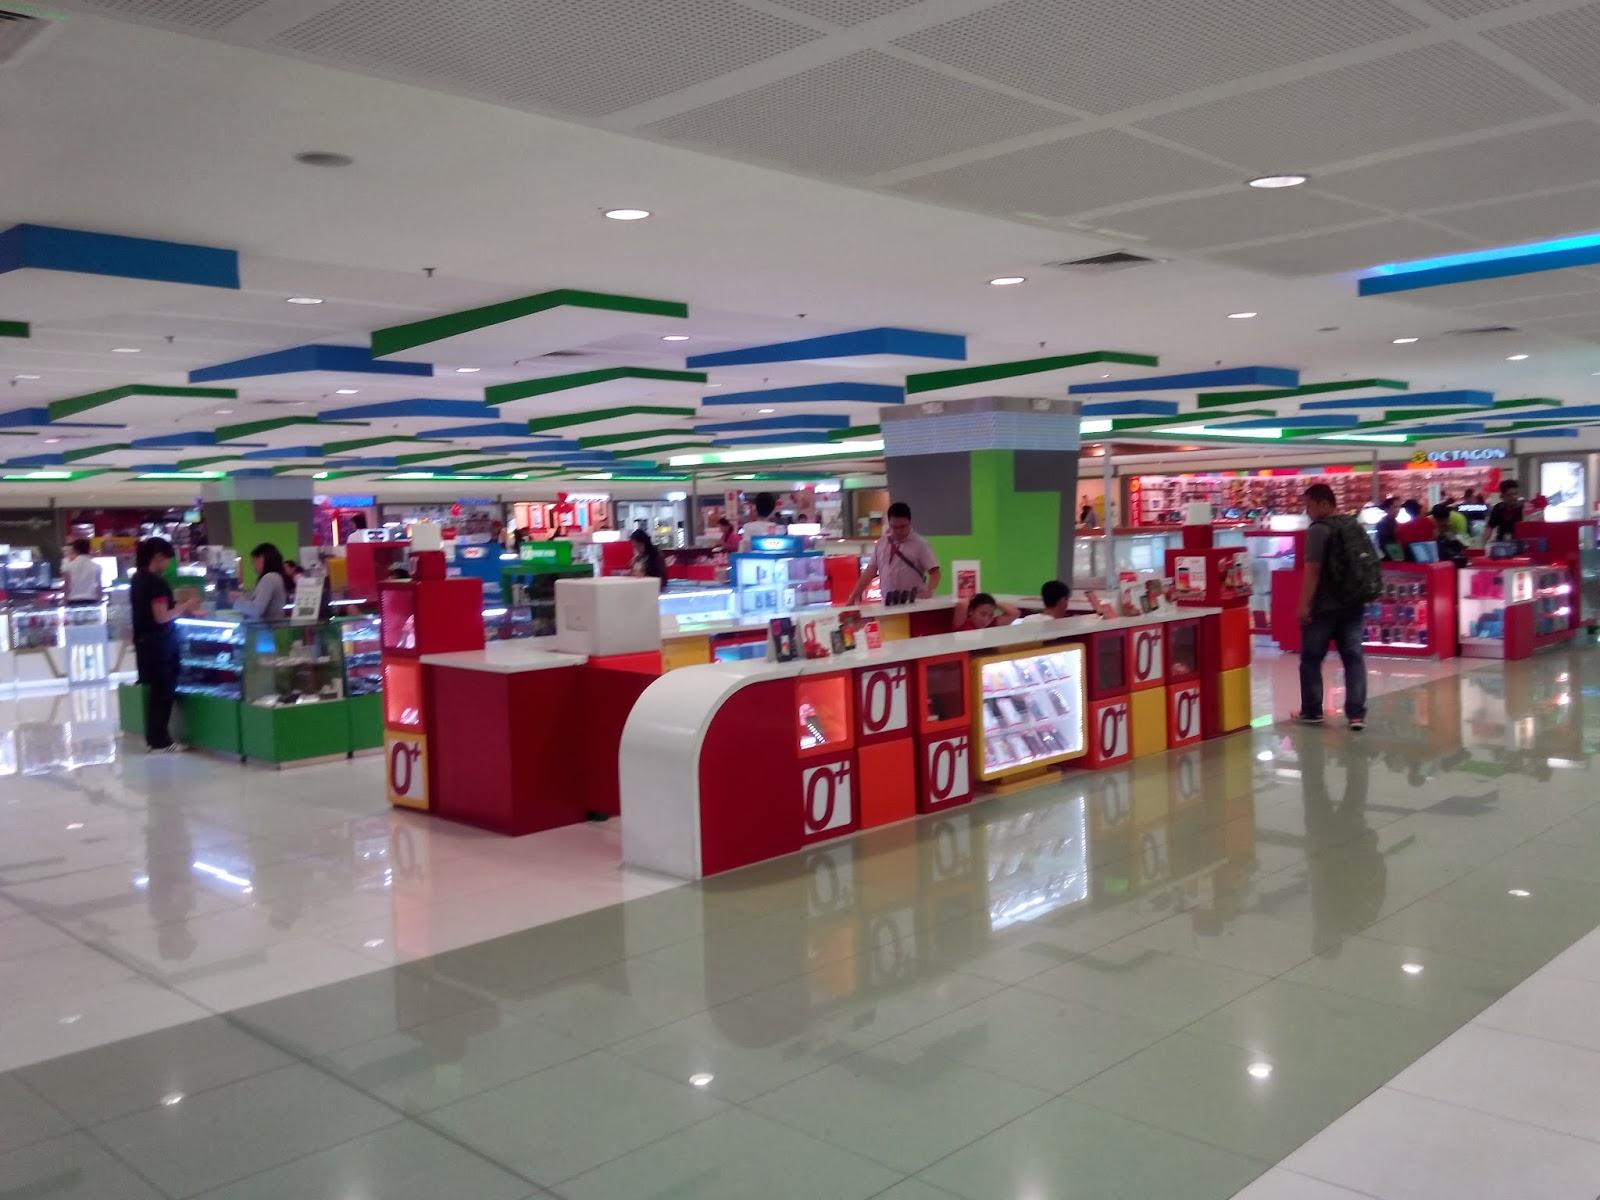 O+ USA Imagine Sample Shot - Inside the mall